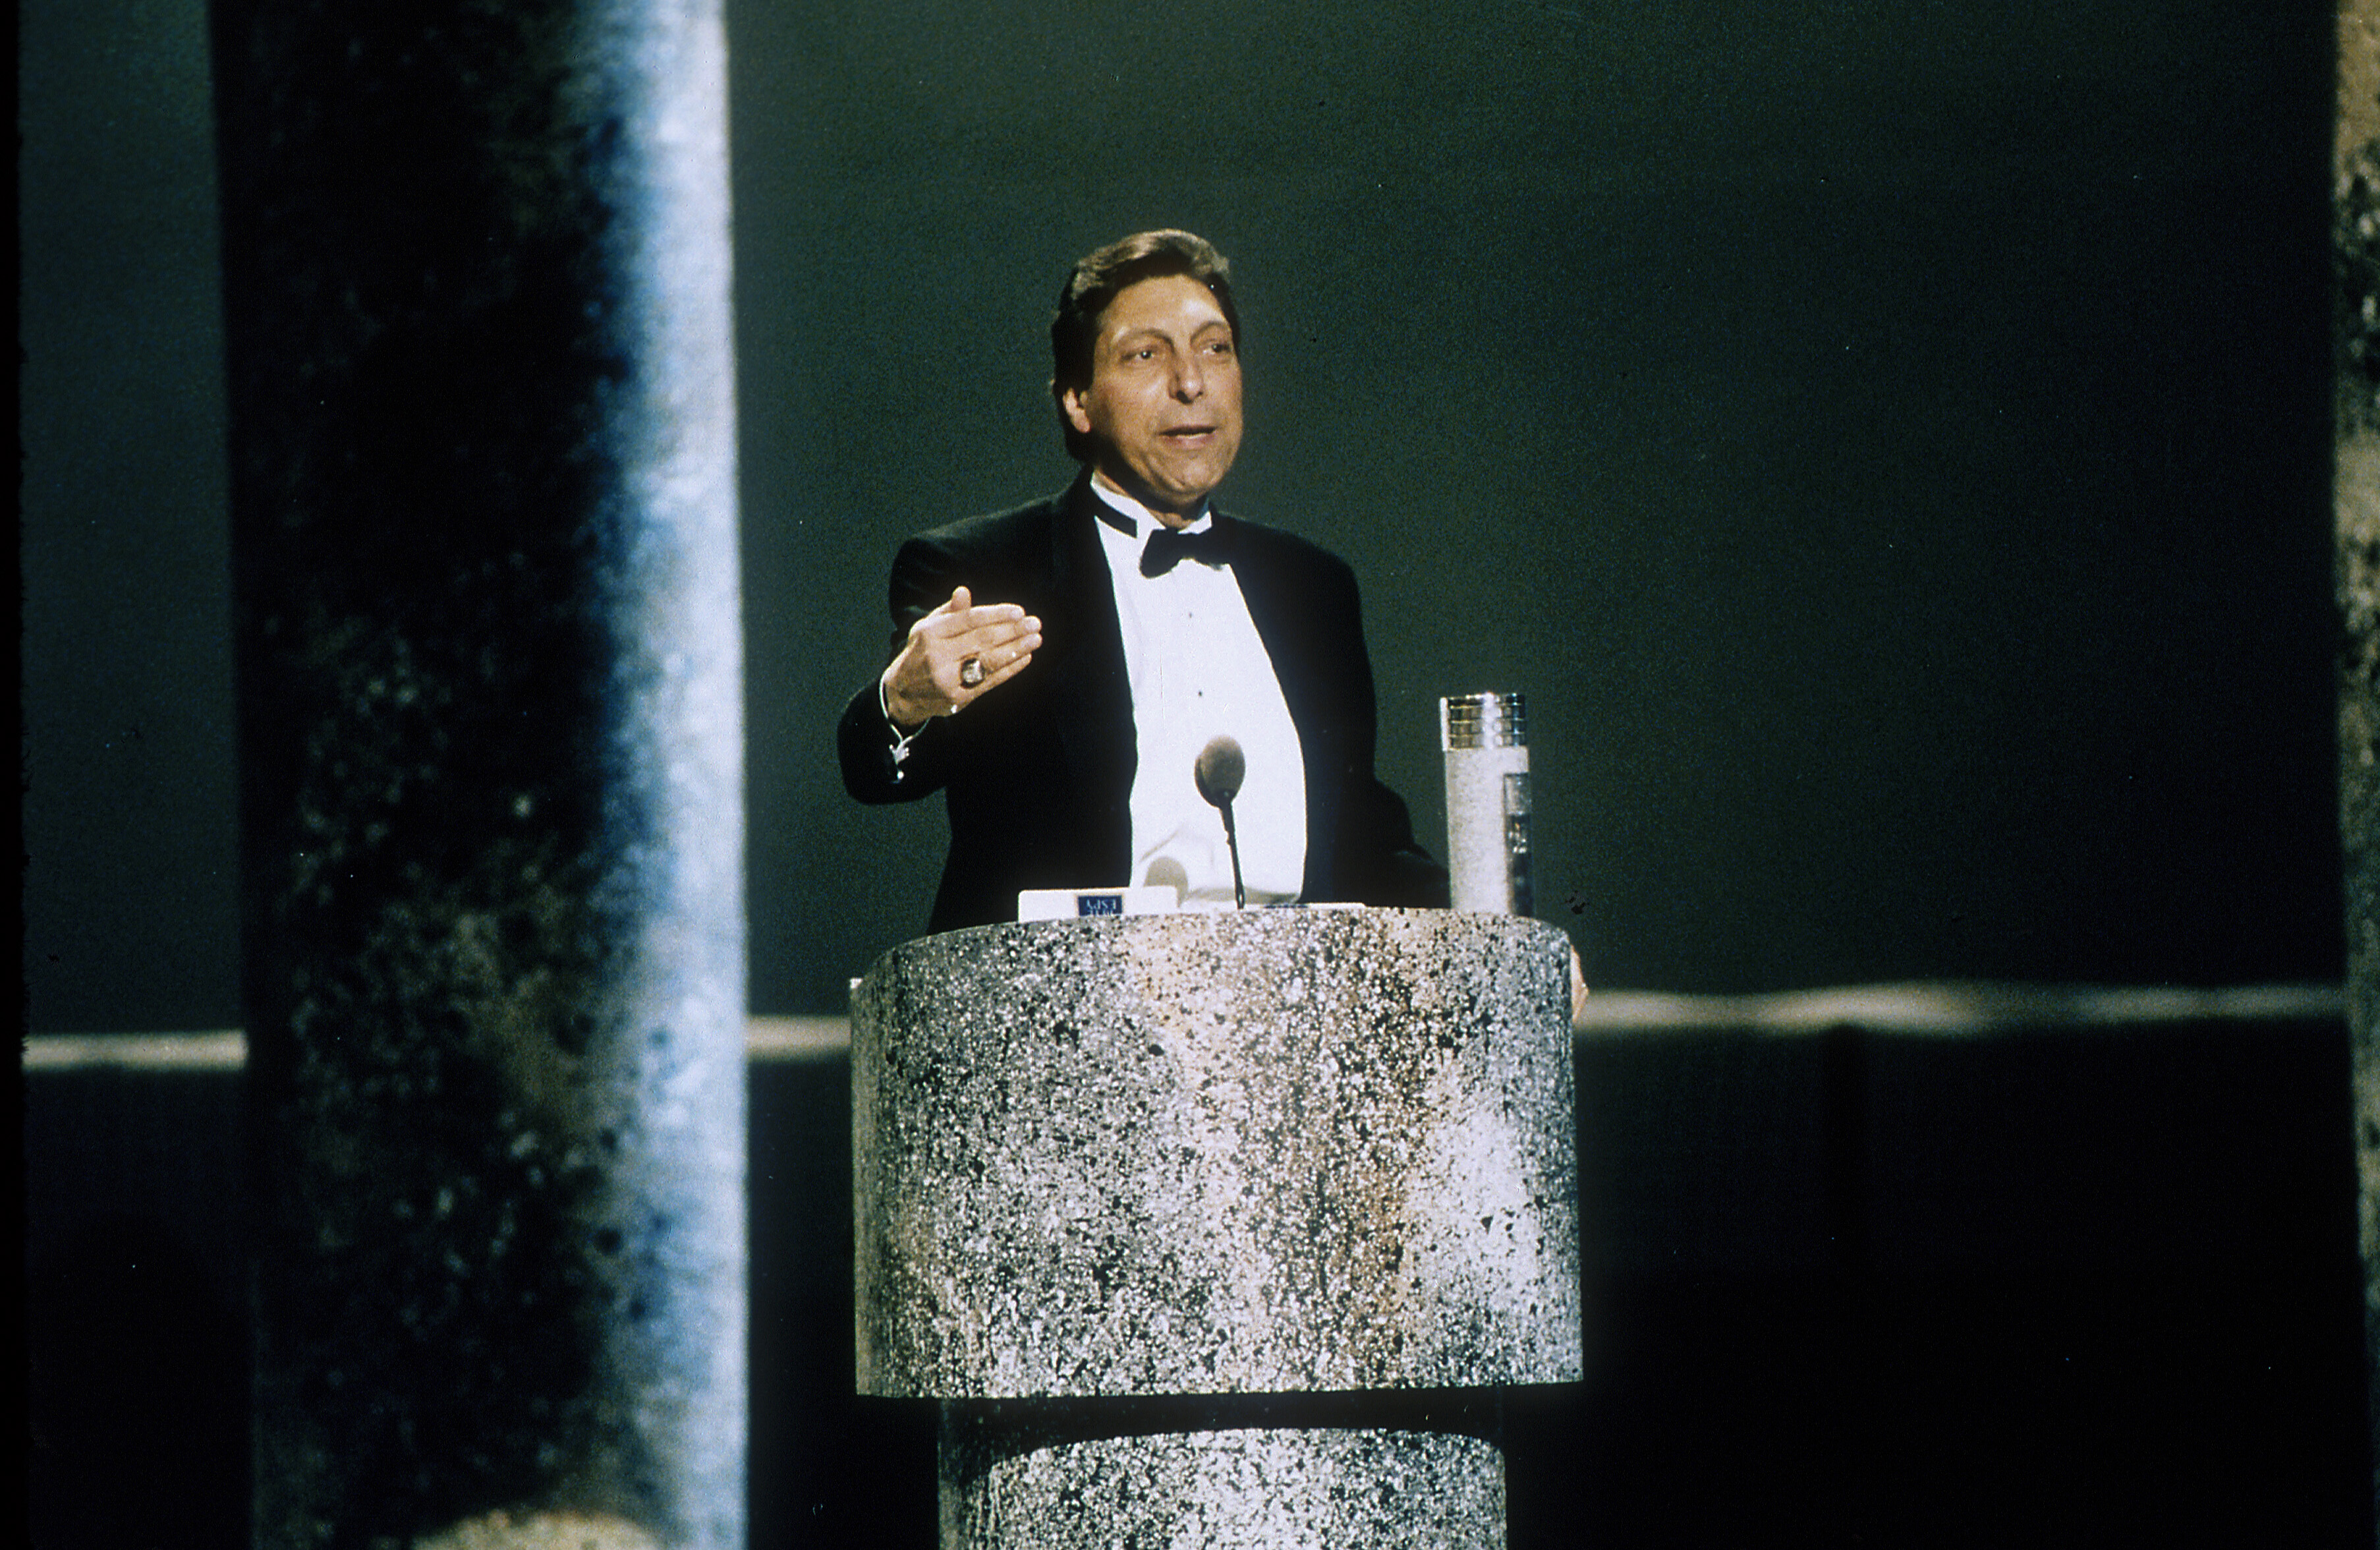 Jim Valvano at the 1993 ESPY Awards